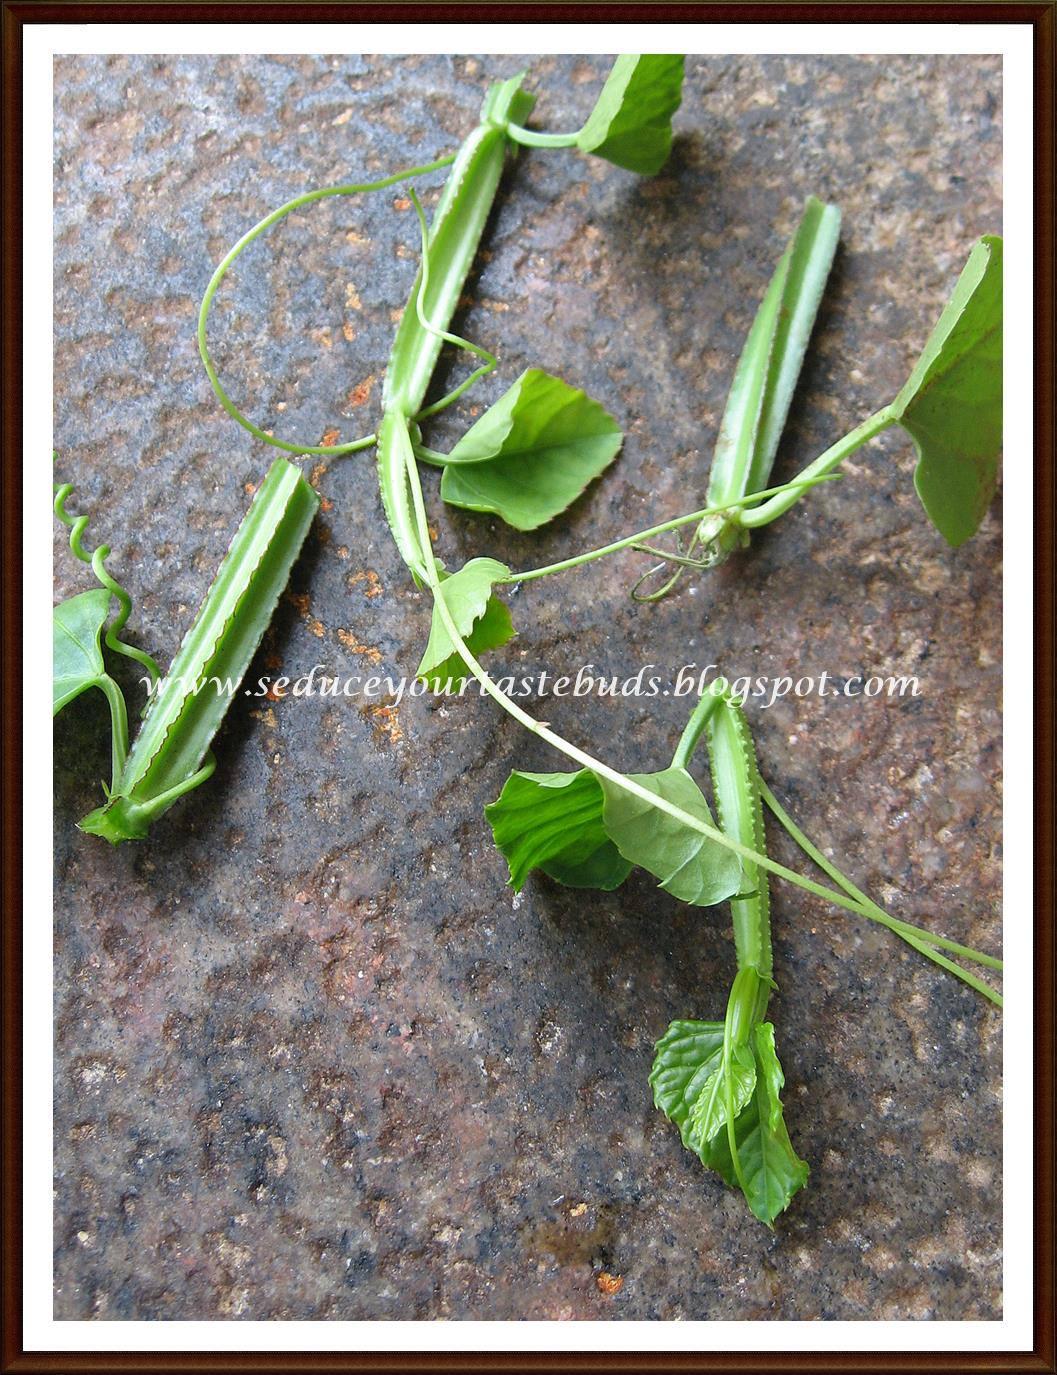 Veldt Grape Cissus Quadrangularis: Seduce Your Tastebuds...: Pirandai Thuvayal / Pirandai Chutney